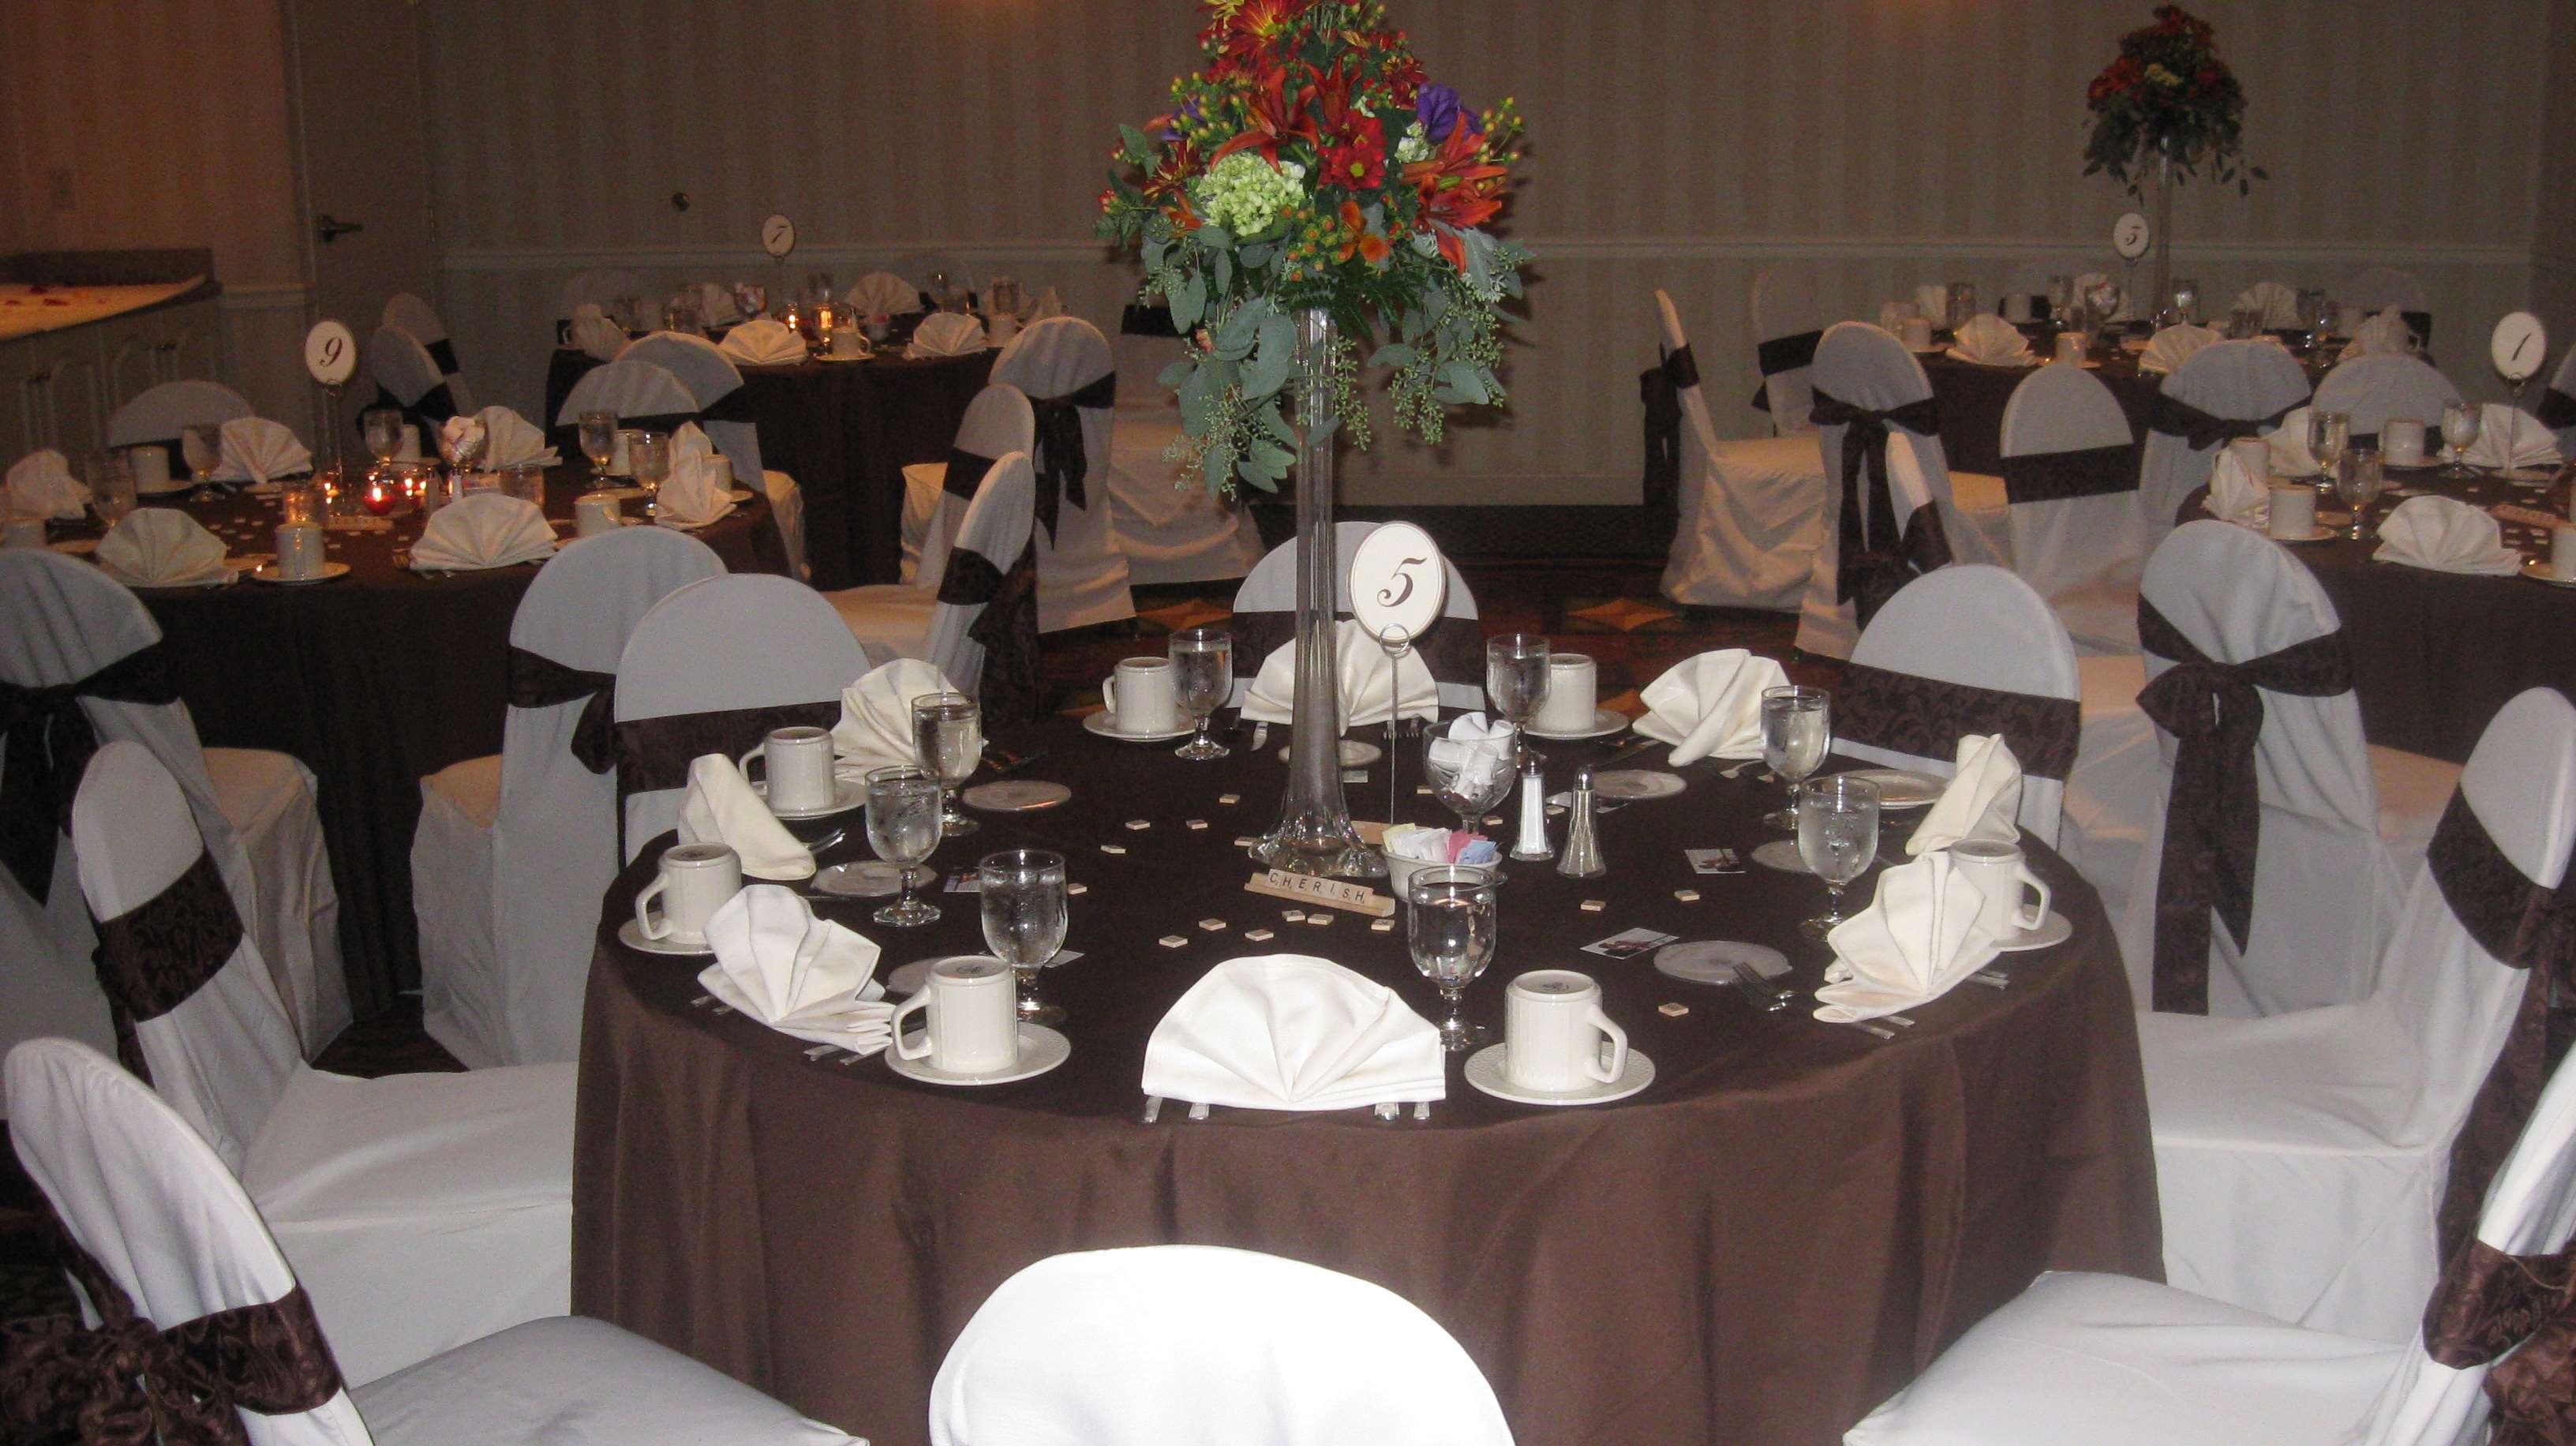 Hilton Garden Inn Elmira/Corning image 31